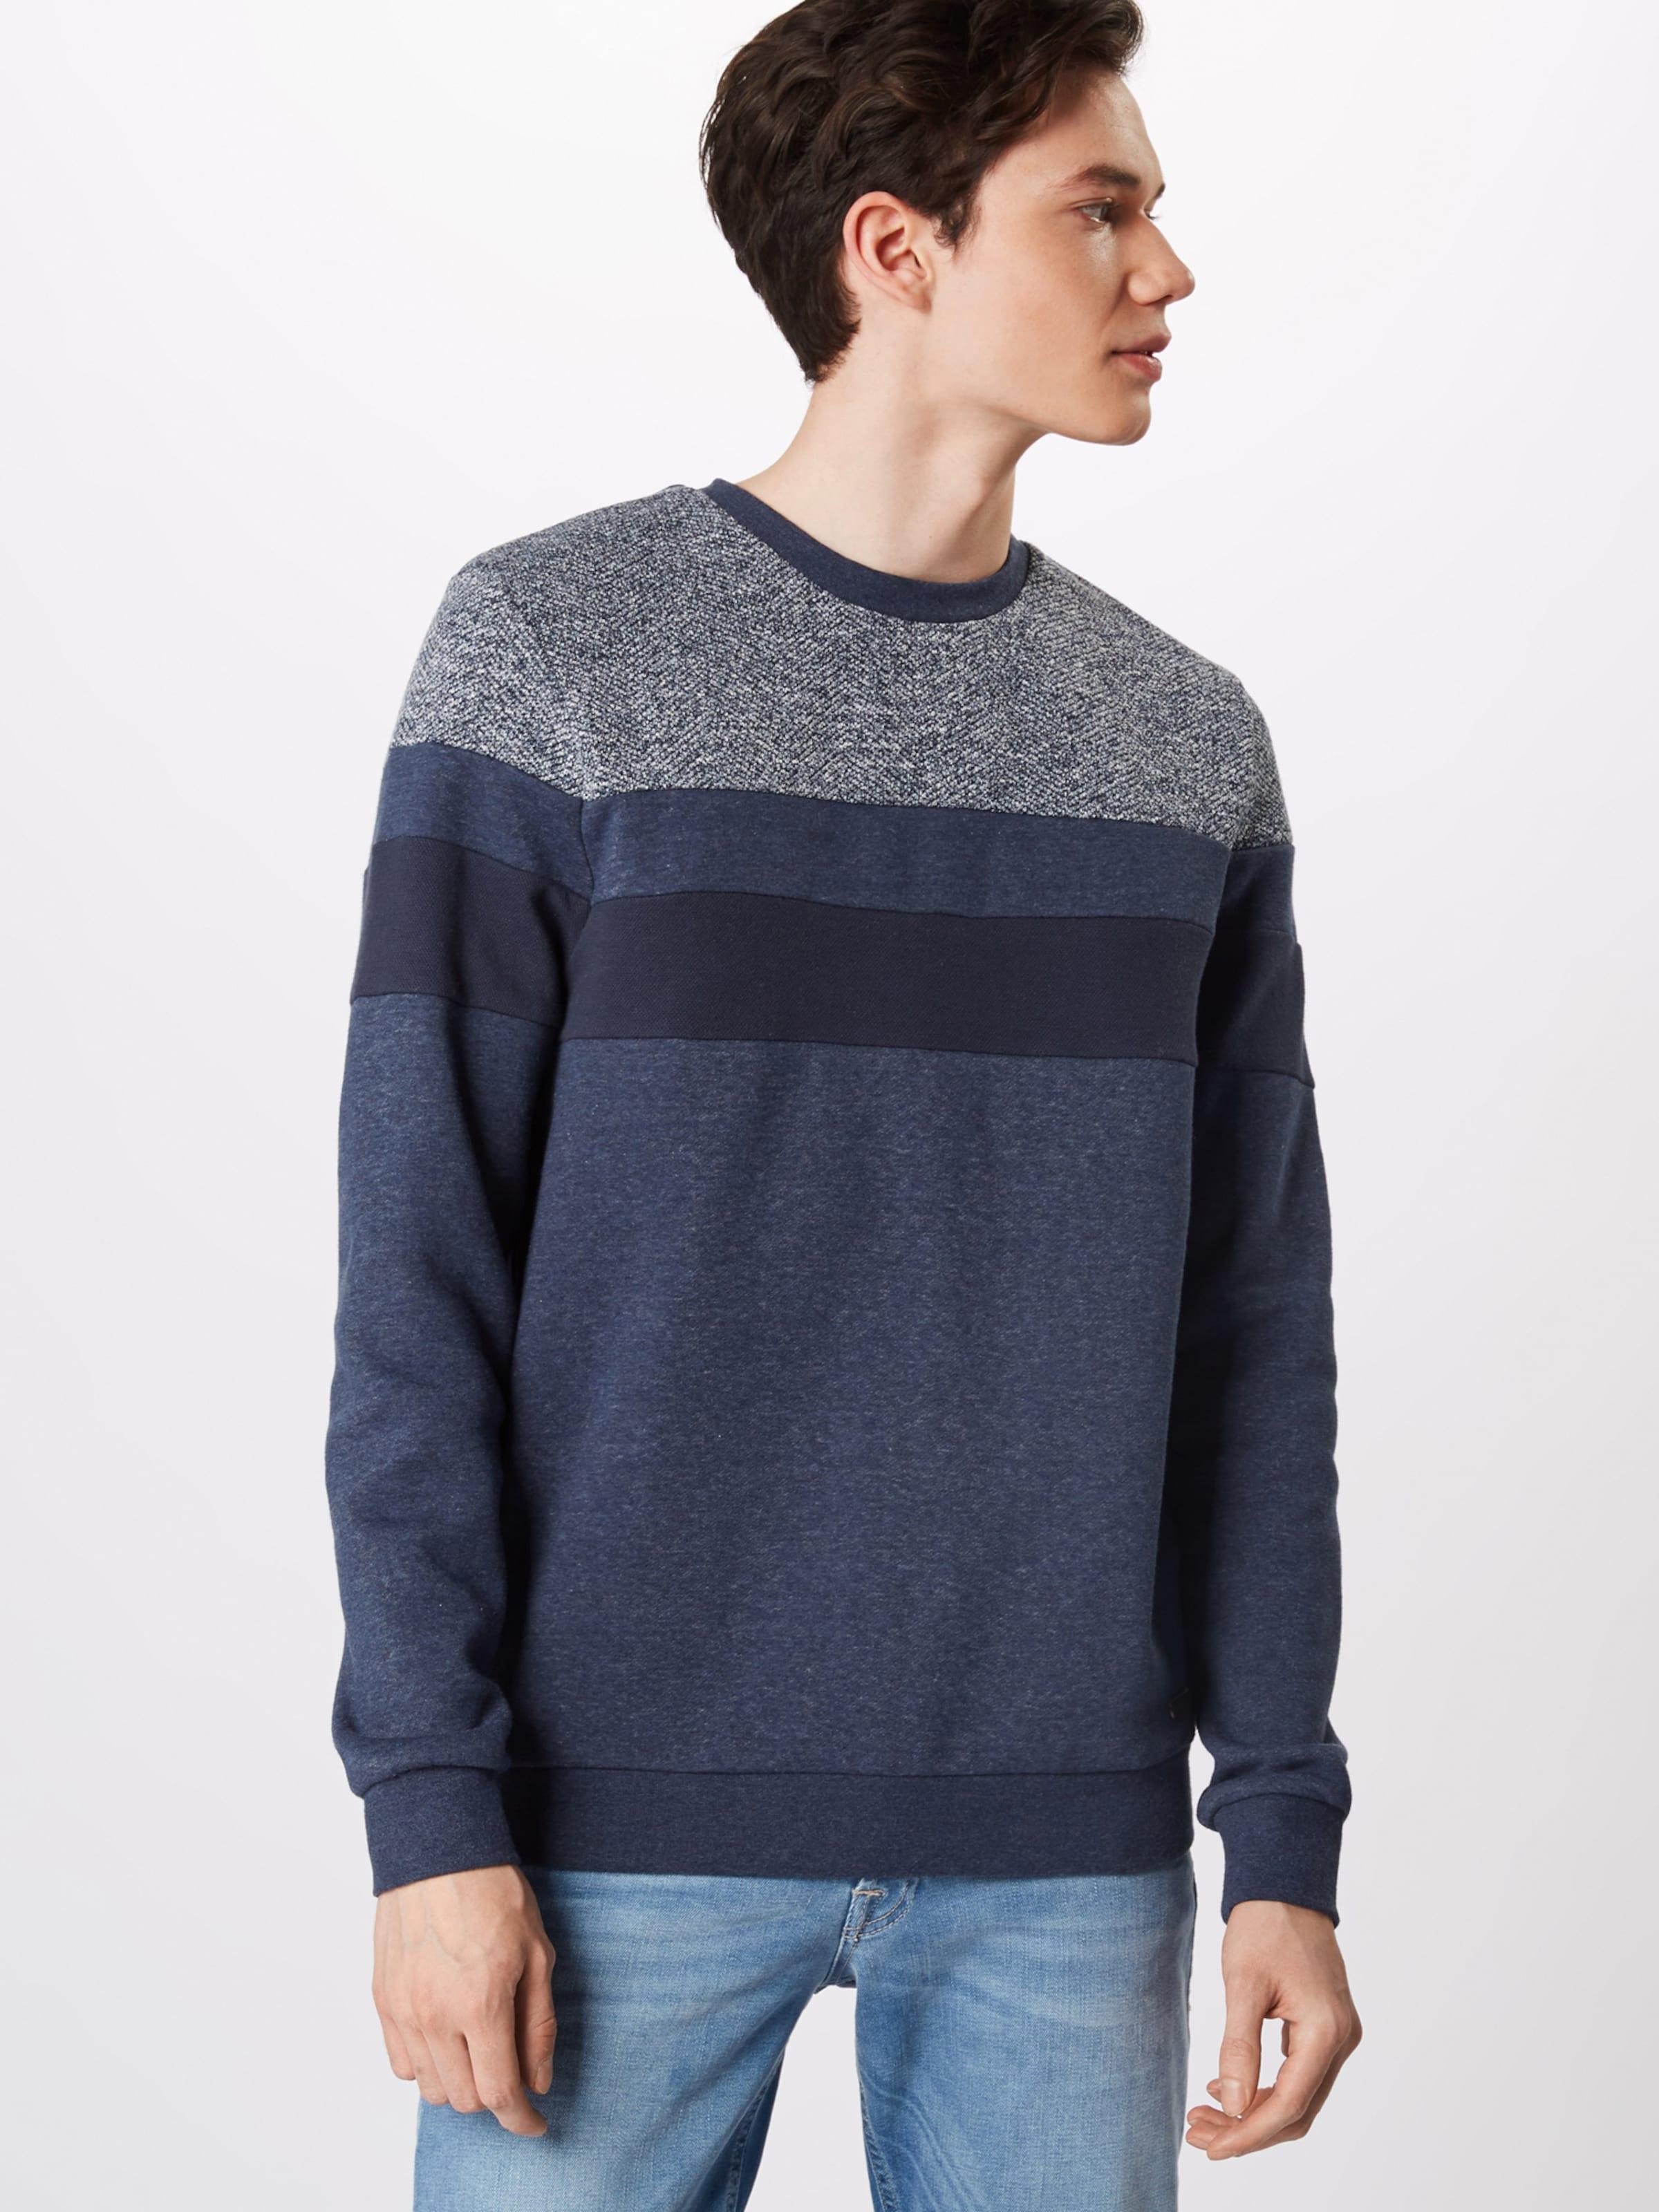 'fabric Sweatshirt By In Mix' Esprit Navy Edc PkuZTiOX